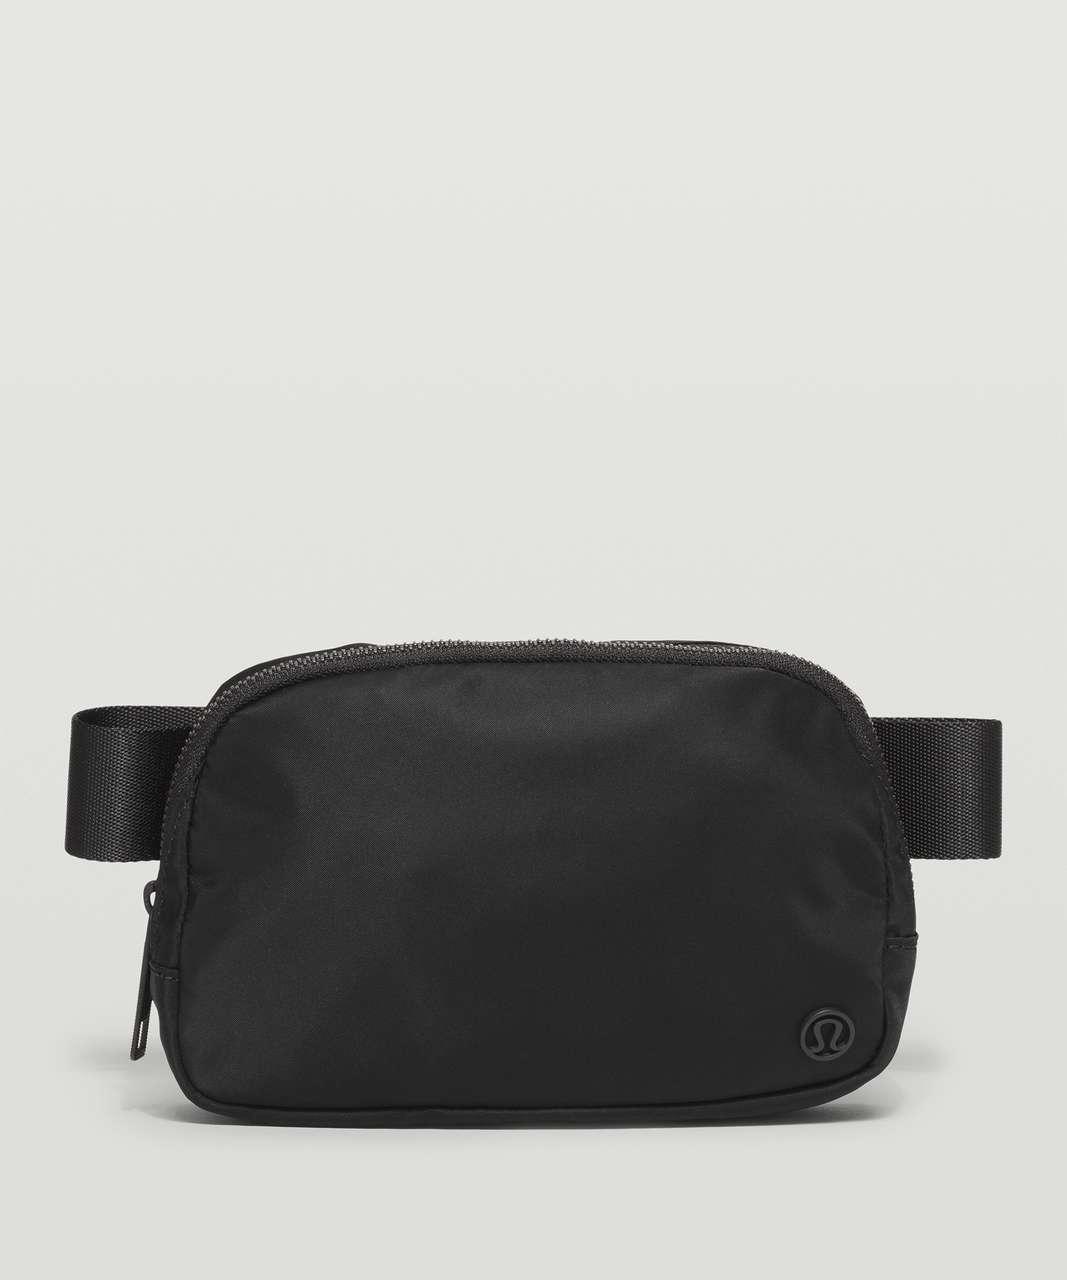 Lululemon Everywhere Belt Bag 1L - Black